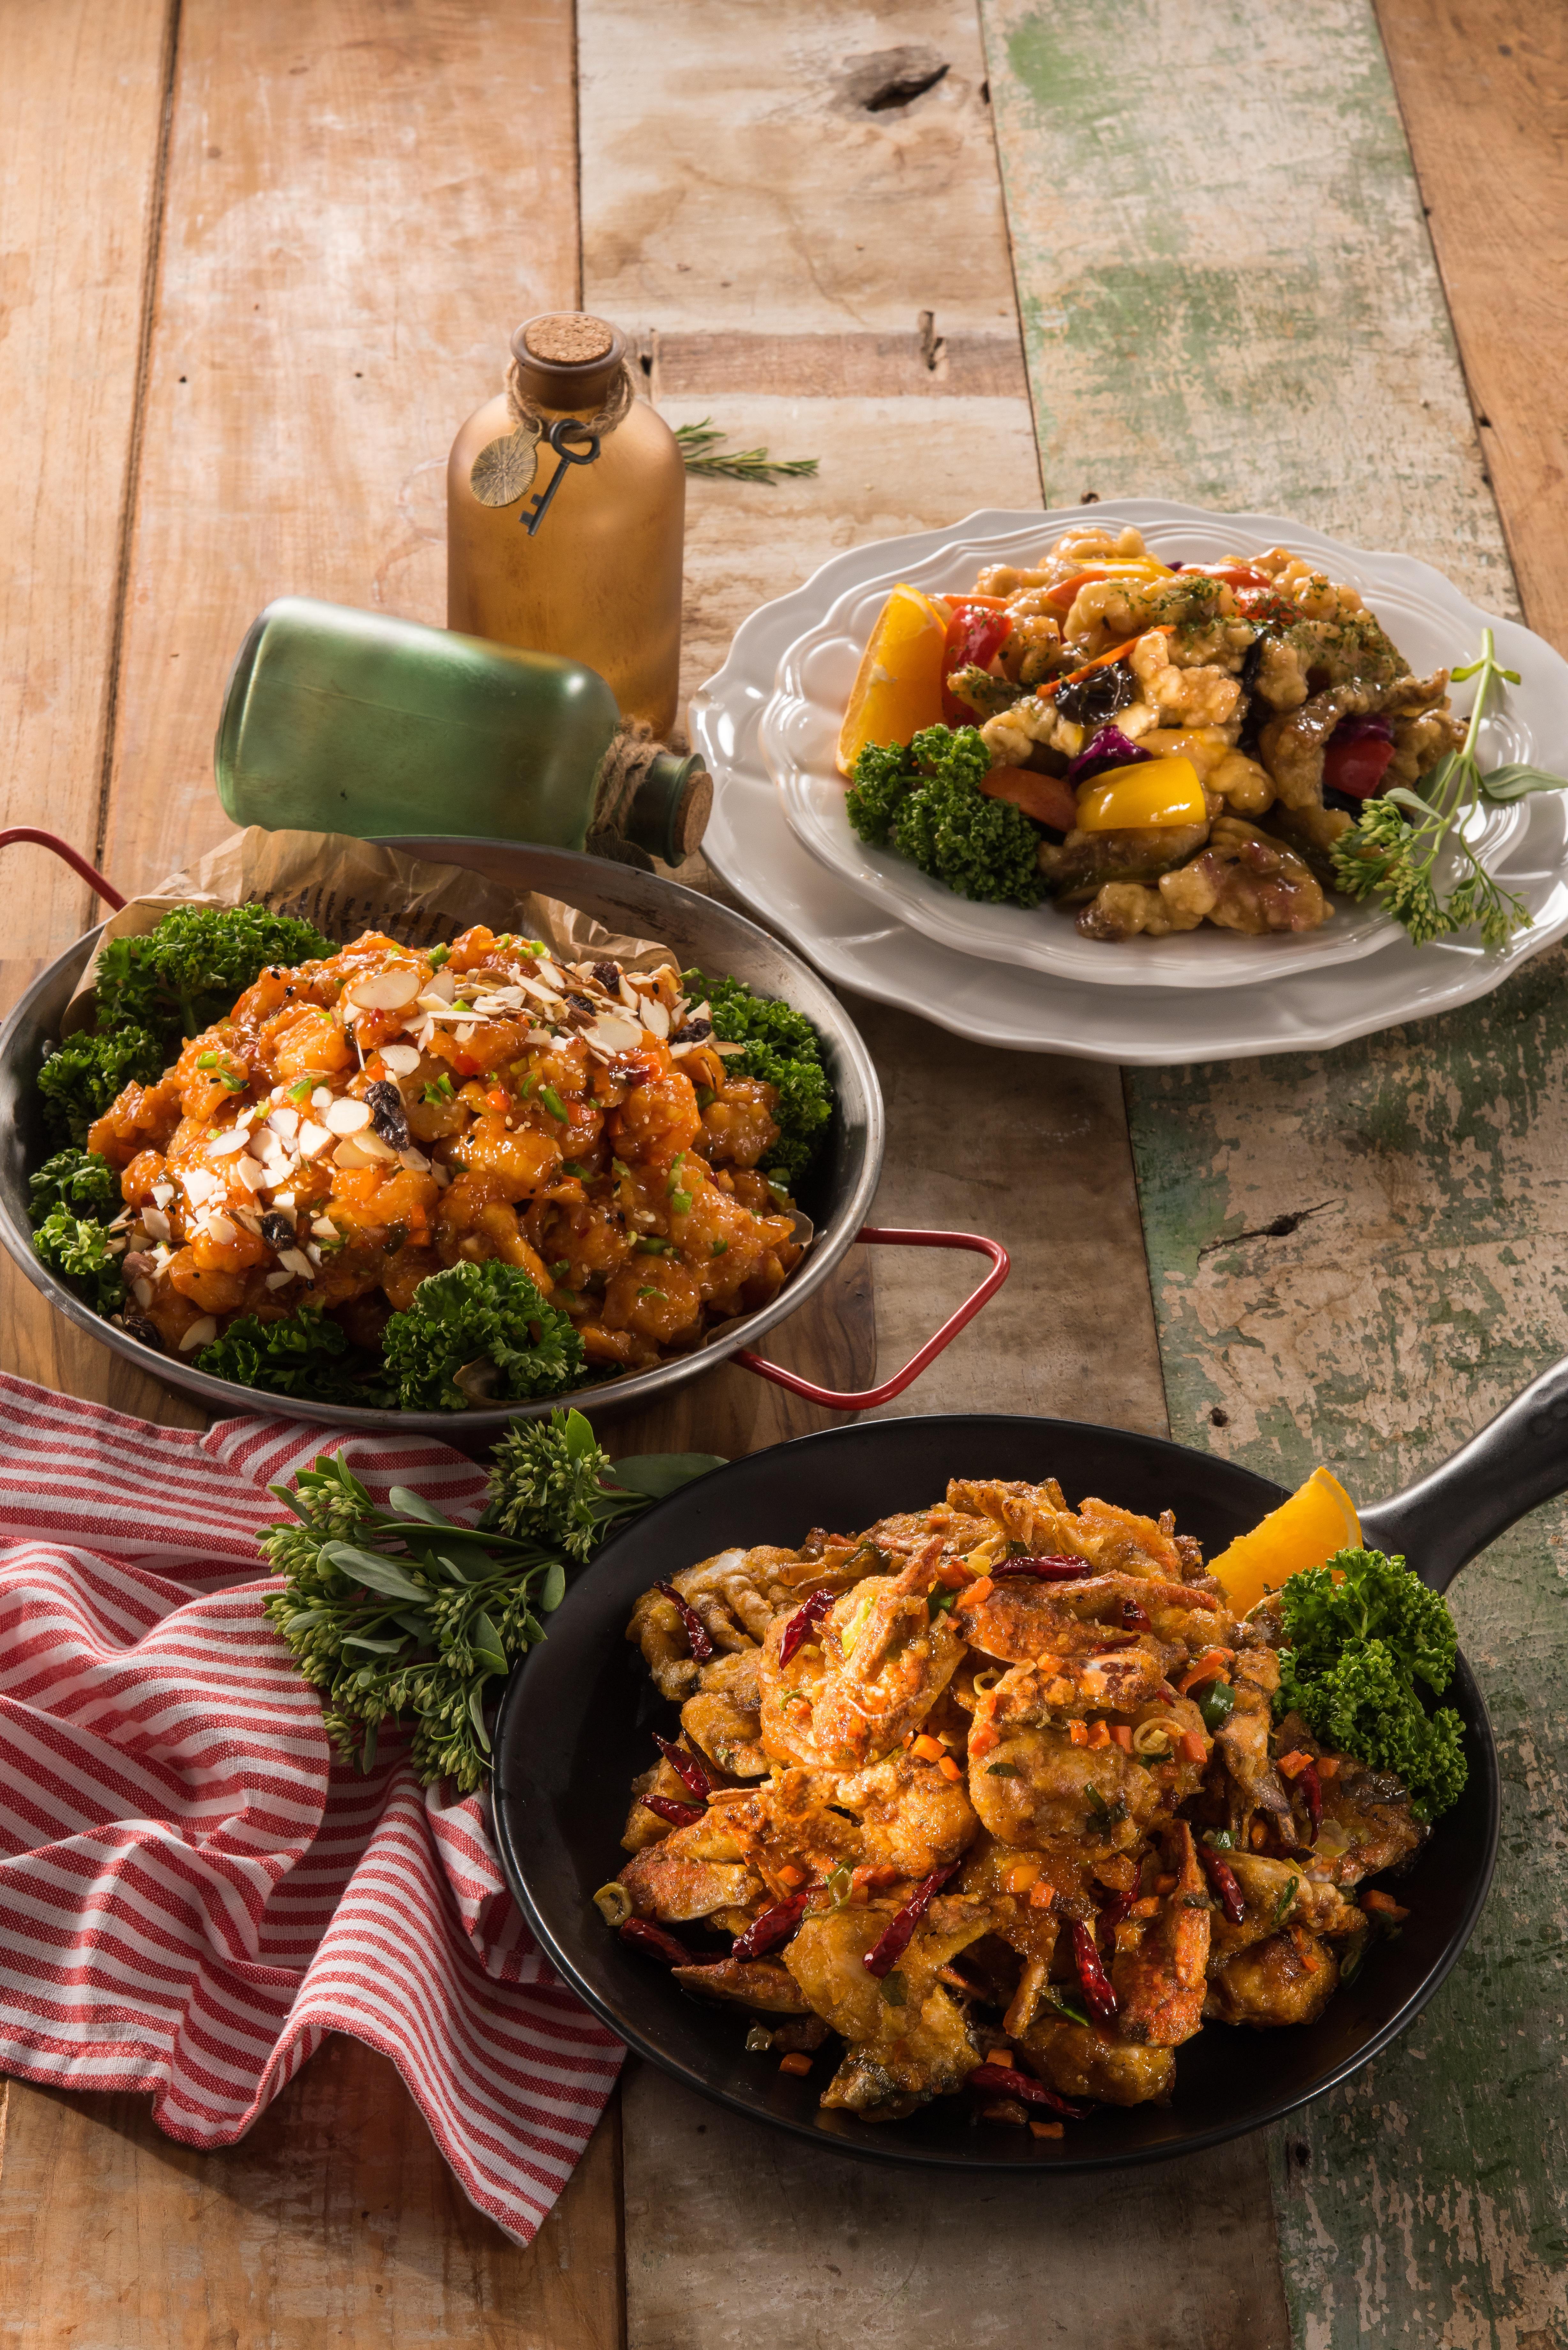 Fotos gratis : plato, vegetal, receta, comer, parilla, pollo, comida ...